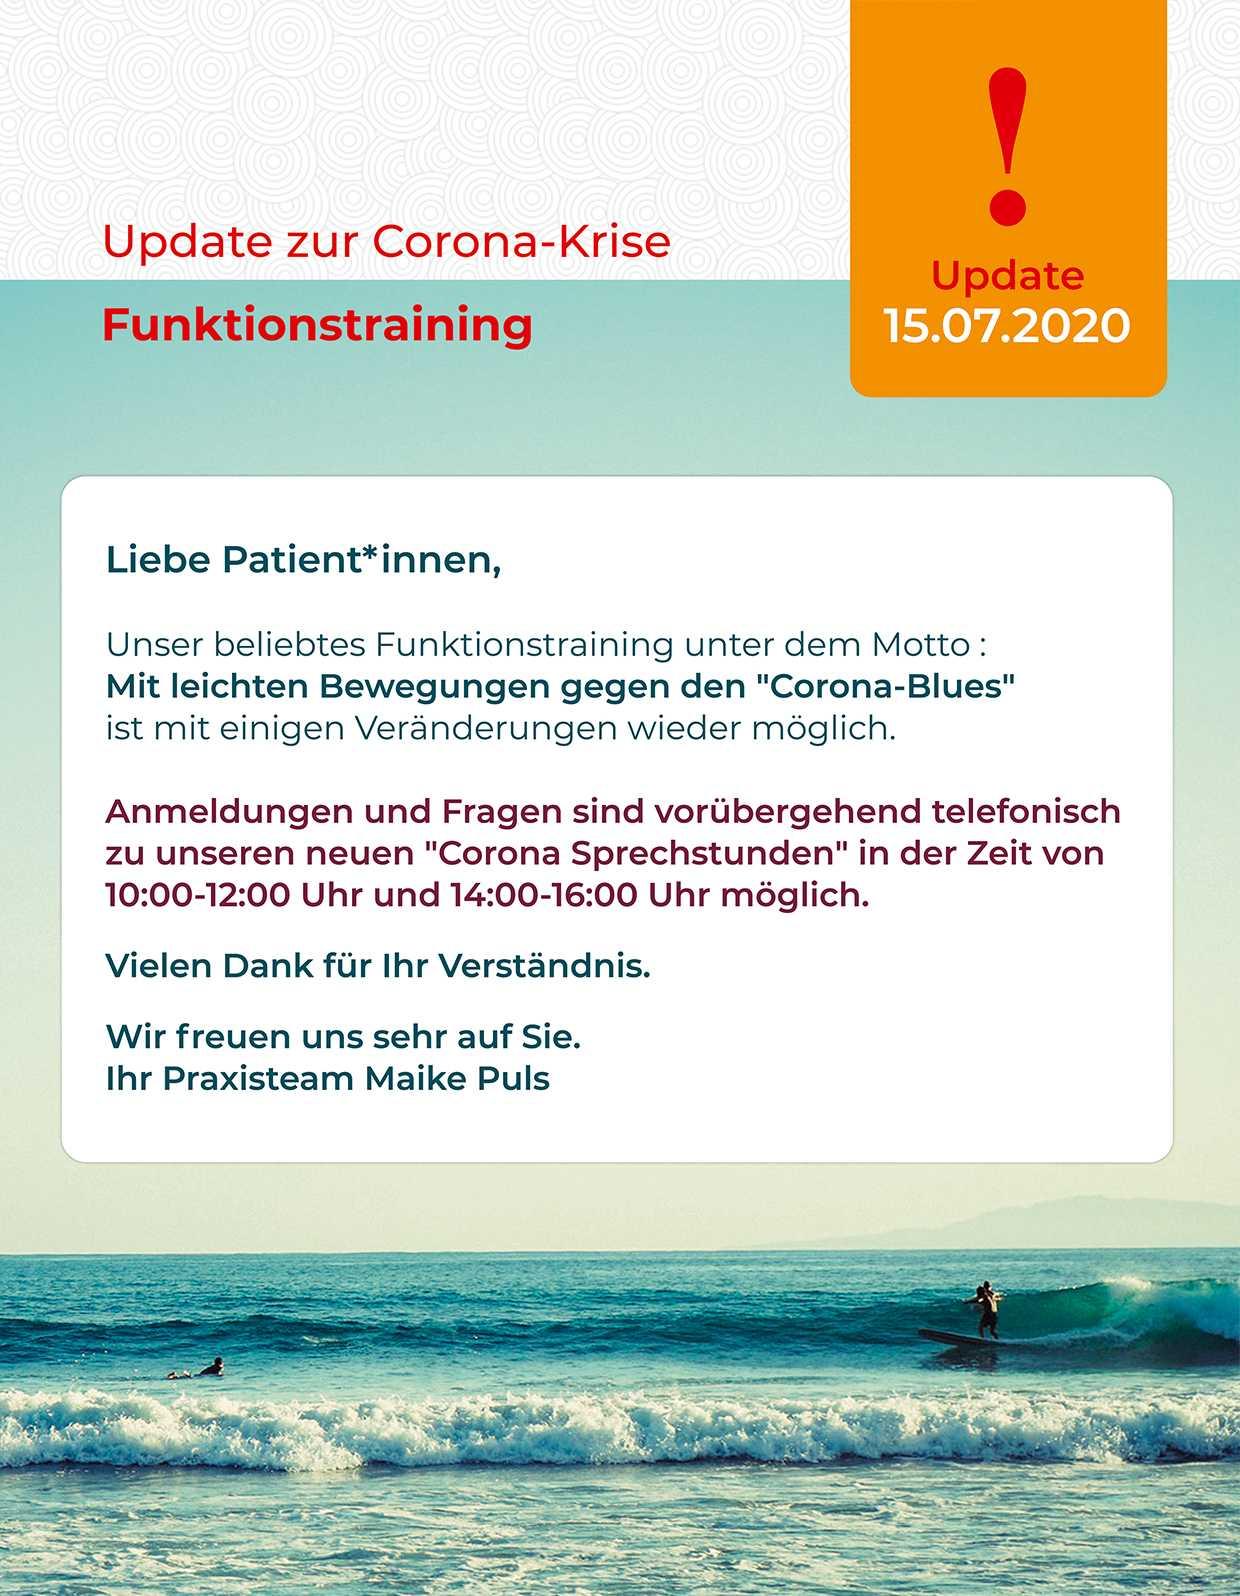 Aktuelle Information zum Coronavirus in unserer Physiotherapiepraxis